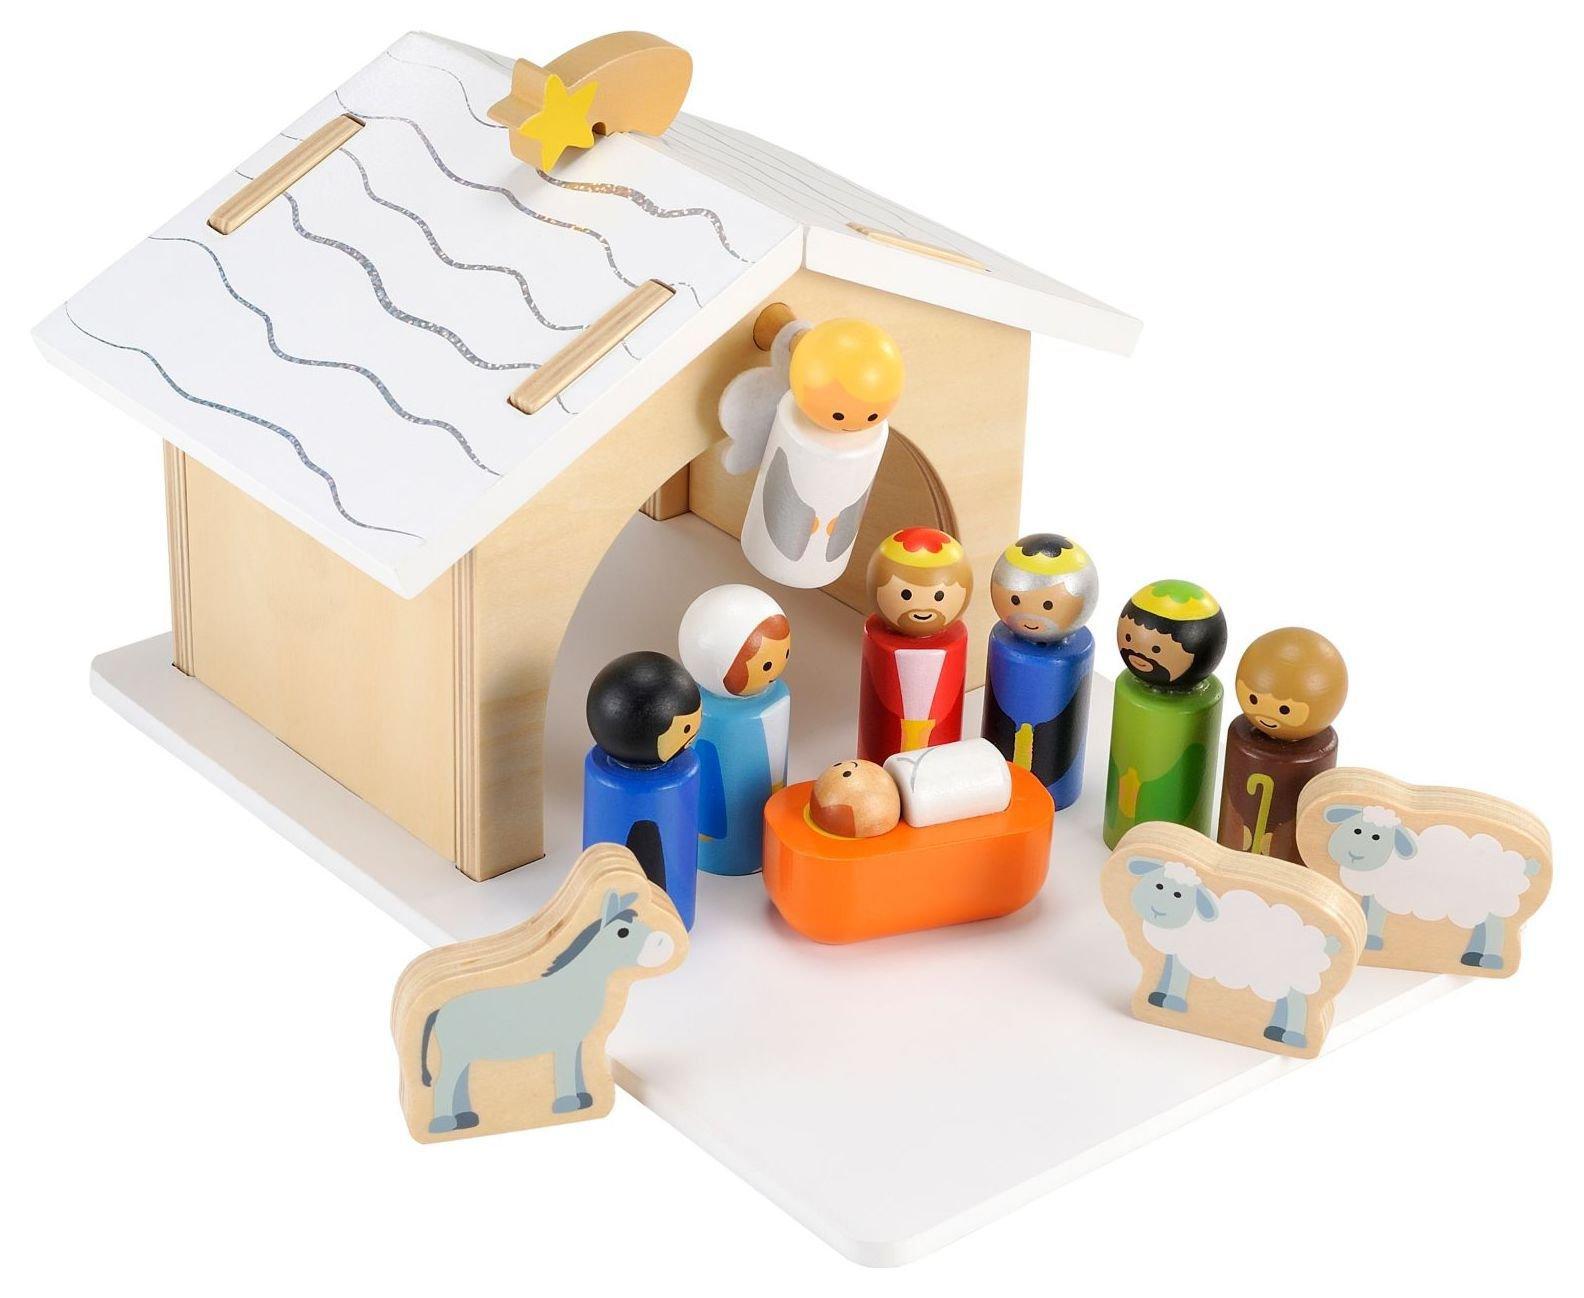 wooden nativity set6148100 - Wooden Nativity Set